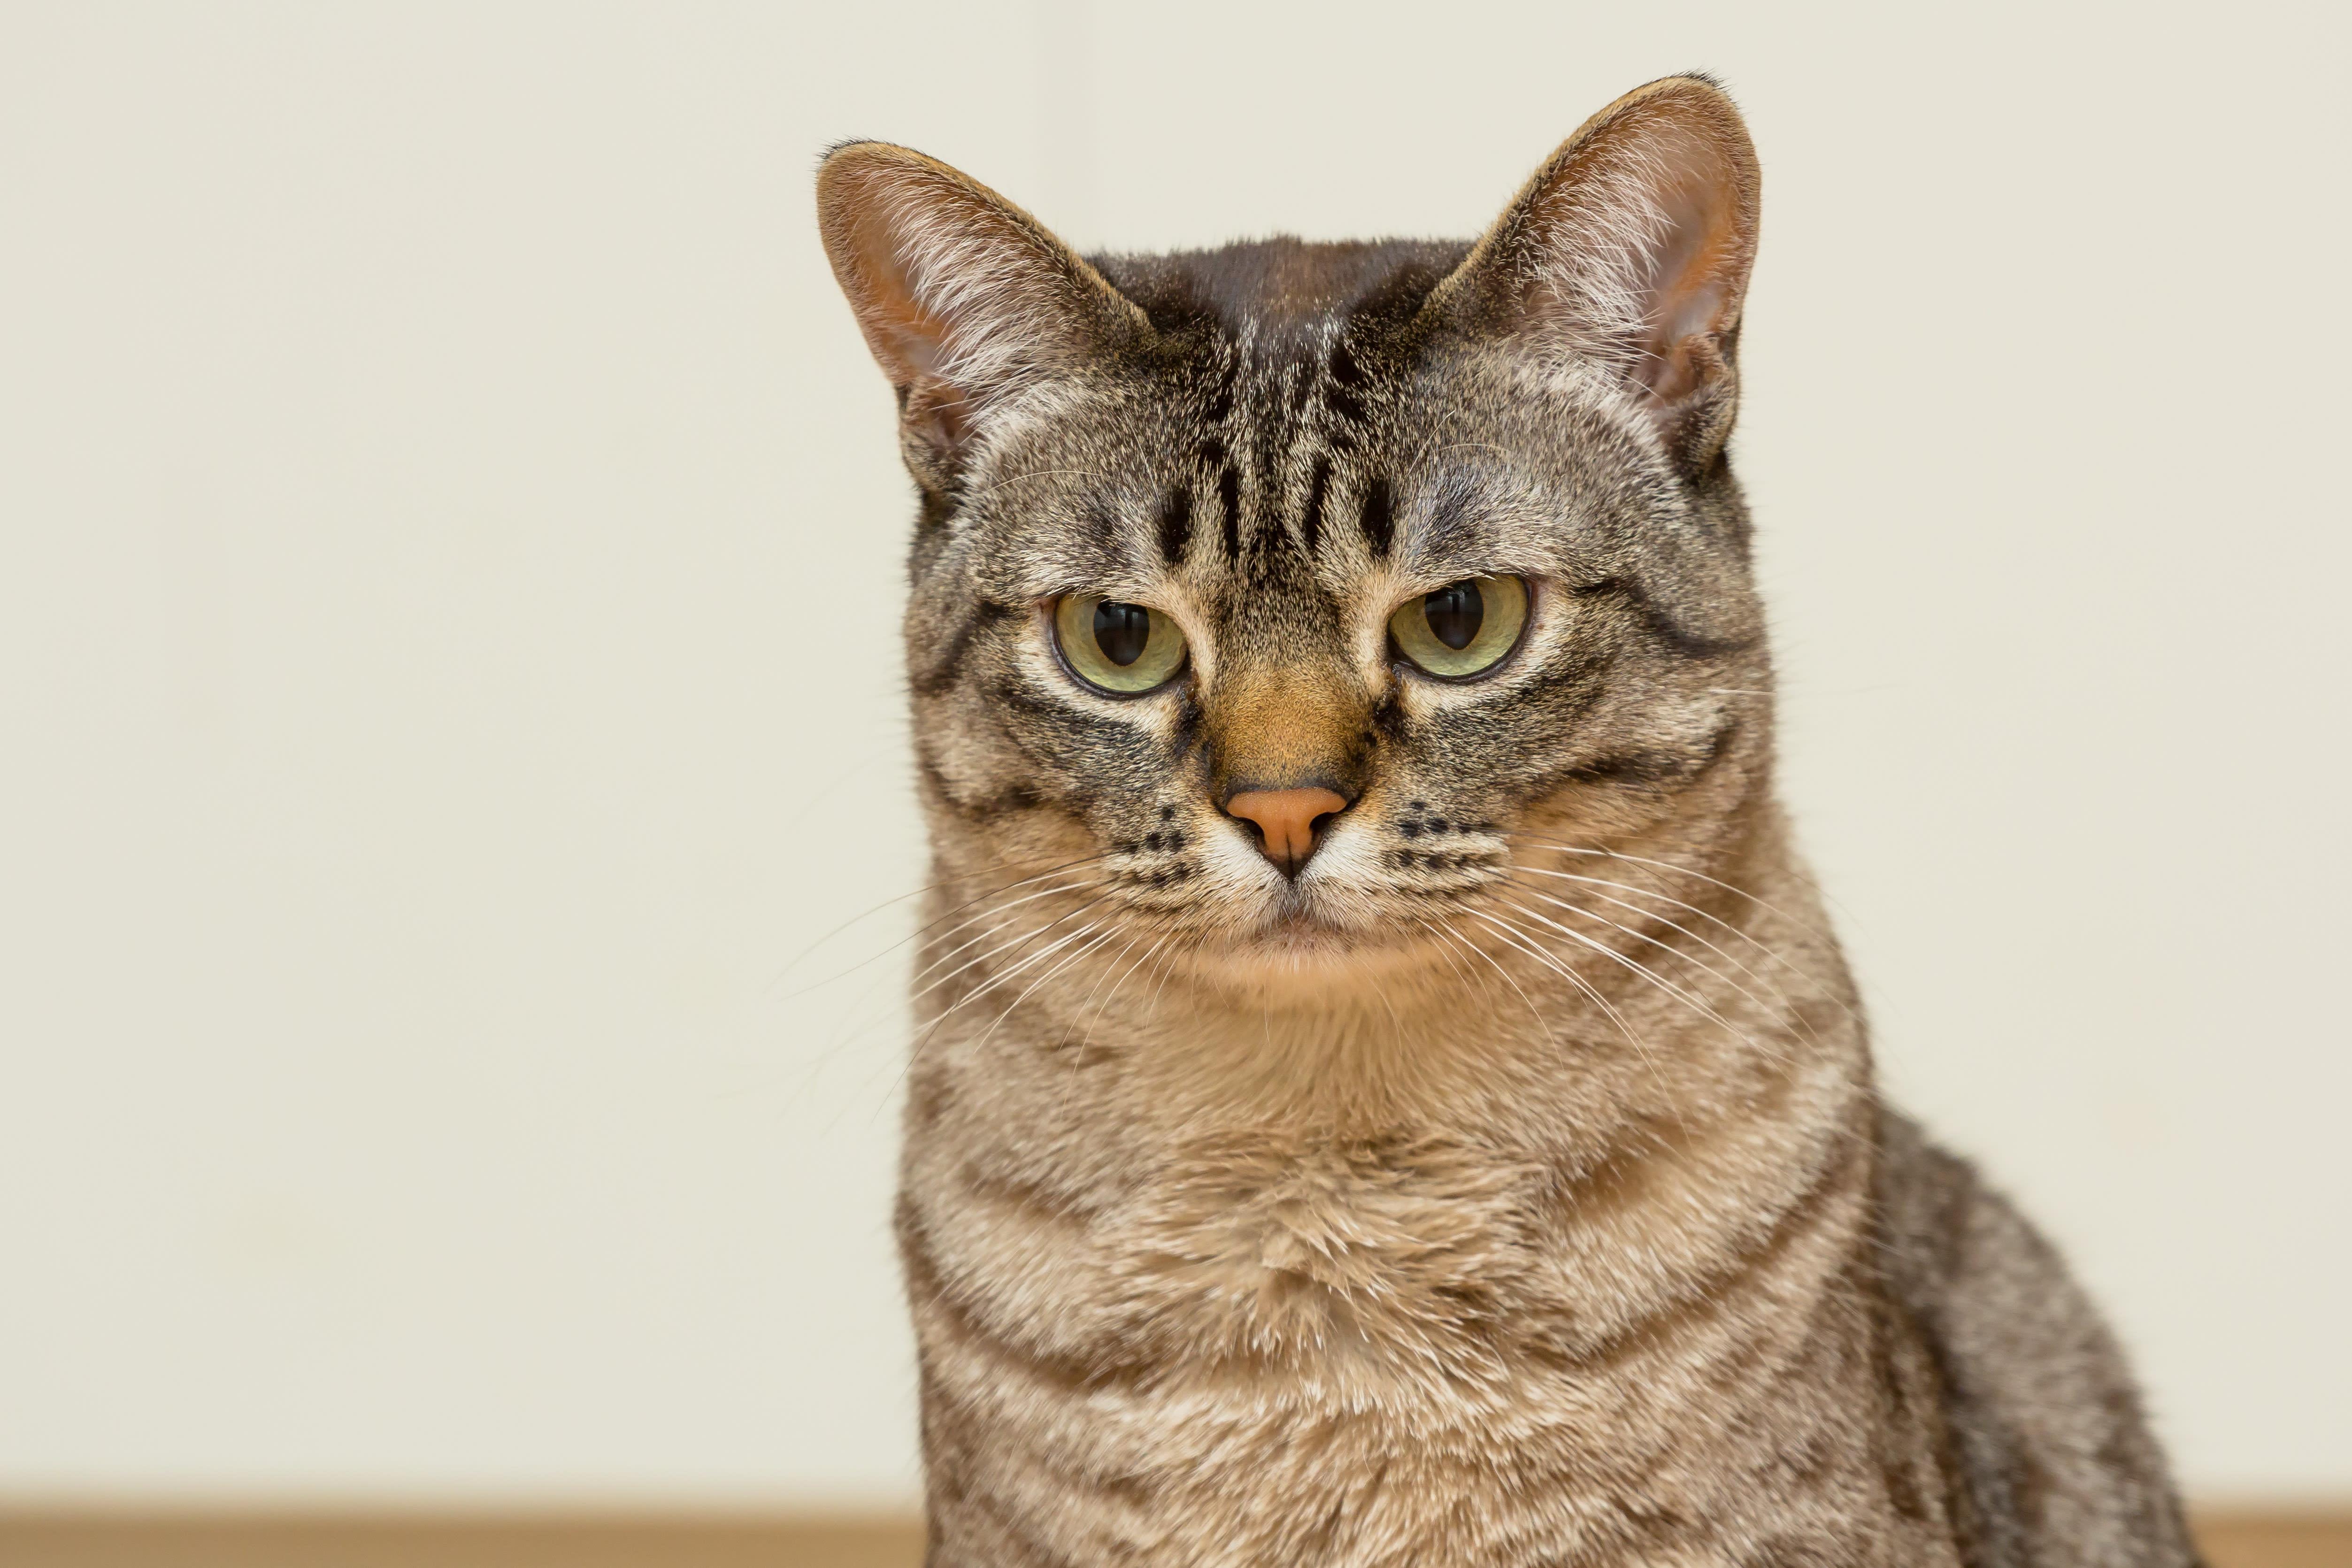 Gatos como Garfield para regalar a tus hijos: 7 razas de mininos atigrados